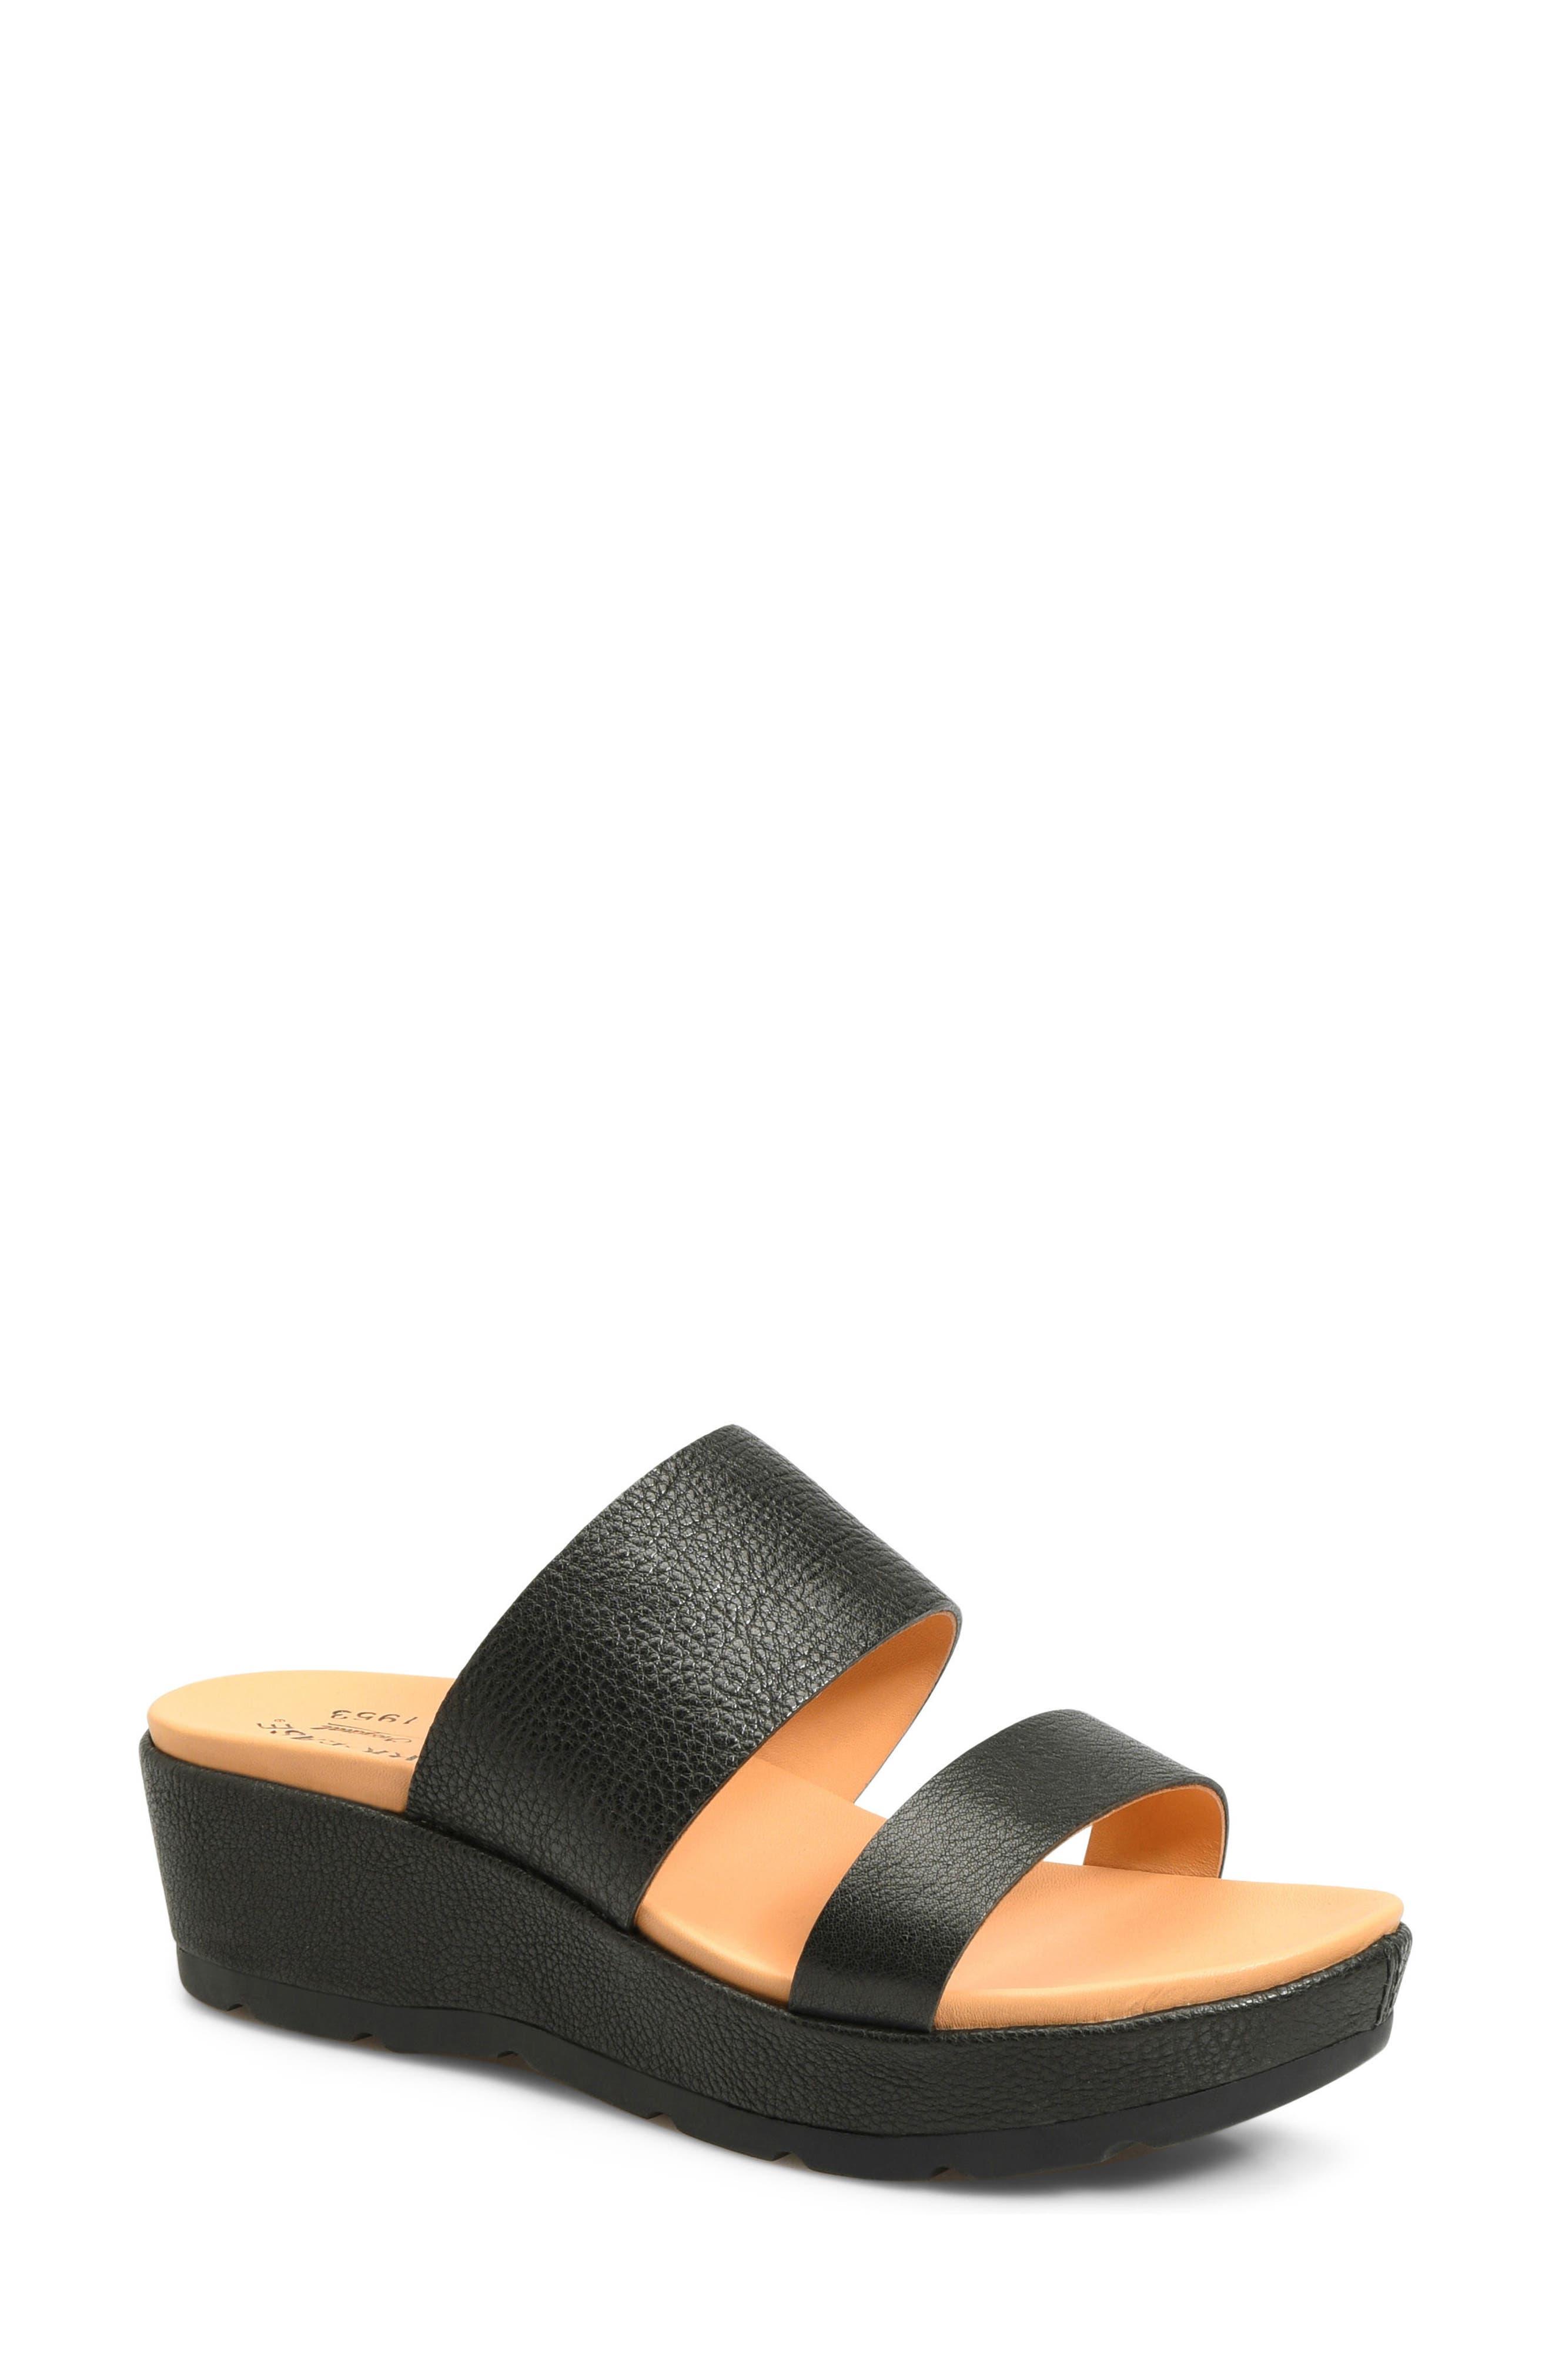 Kork-Ease Kane Platform Sandal